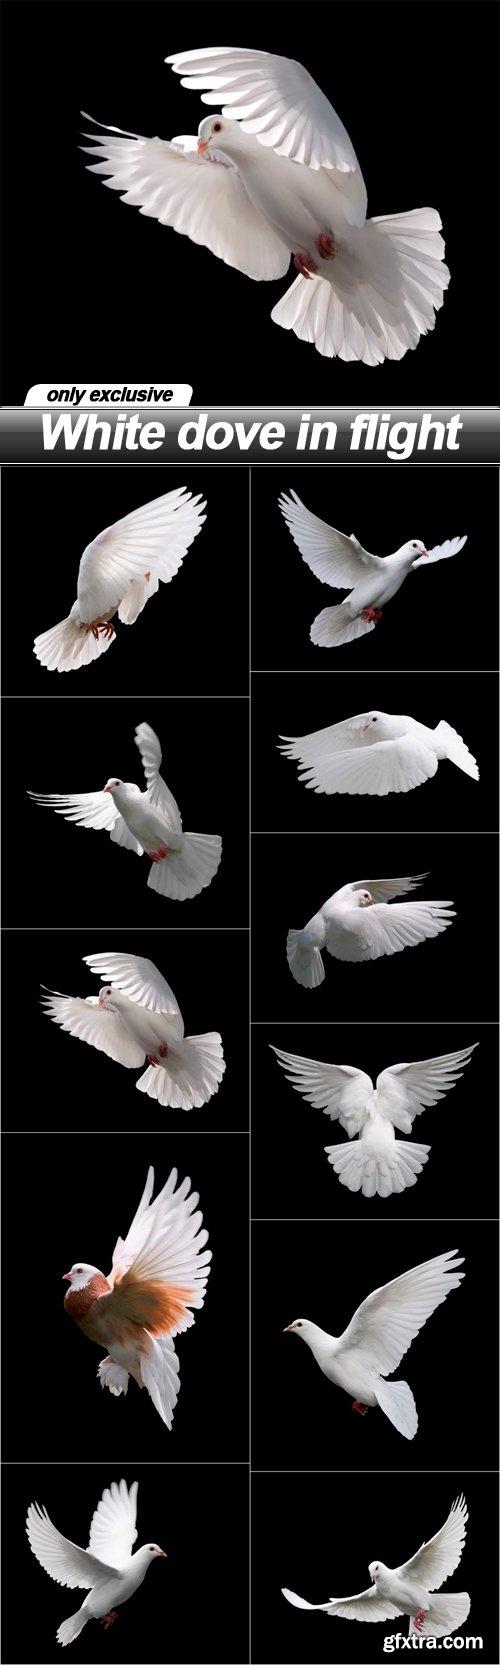 White dove in flight - 11 UHQ JPEG